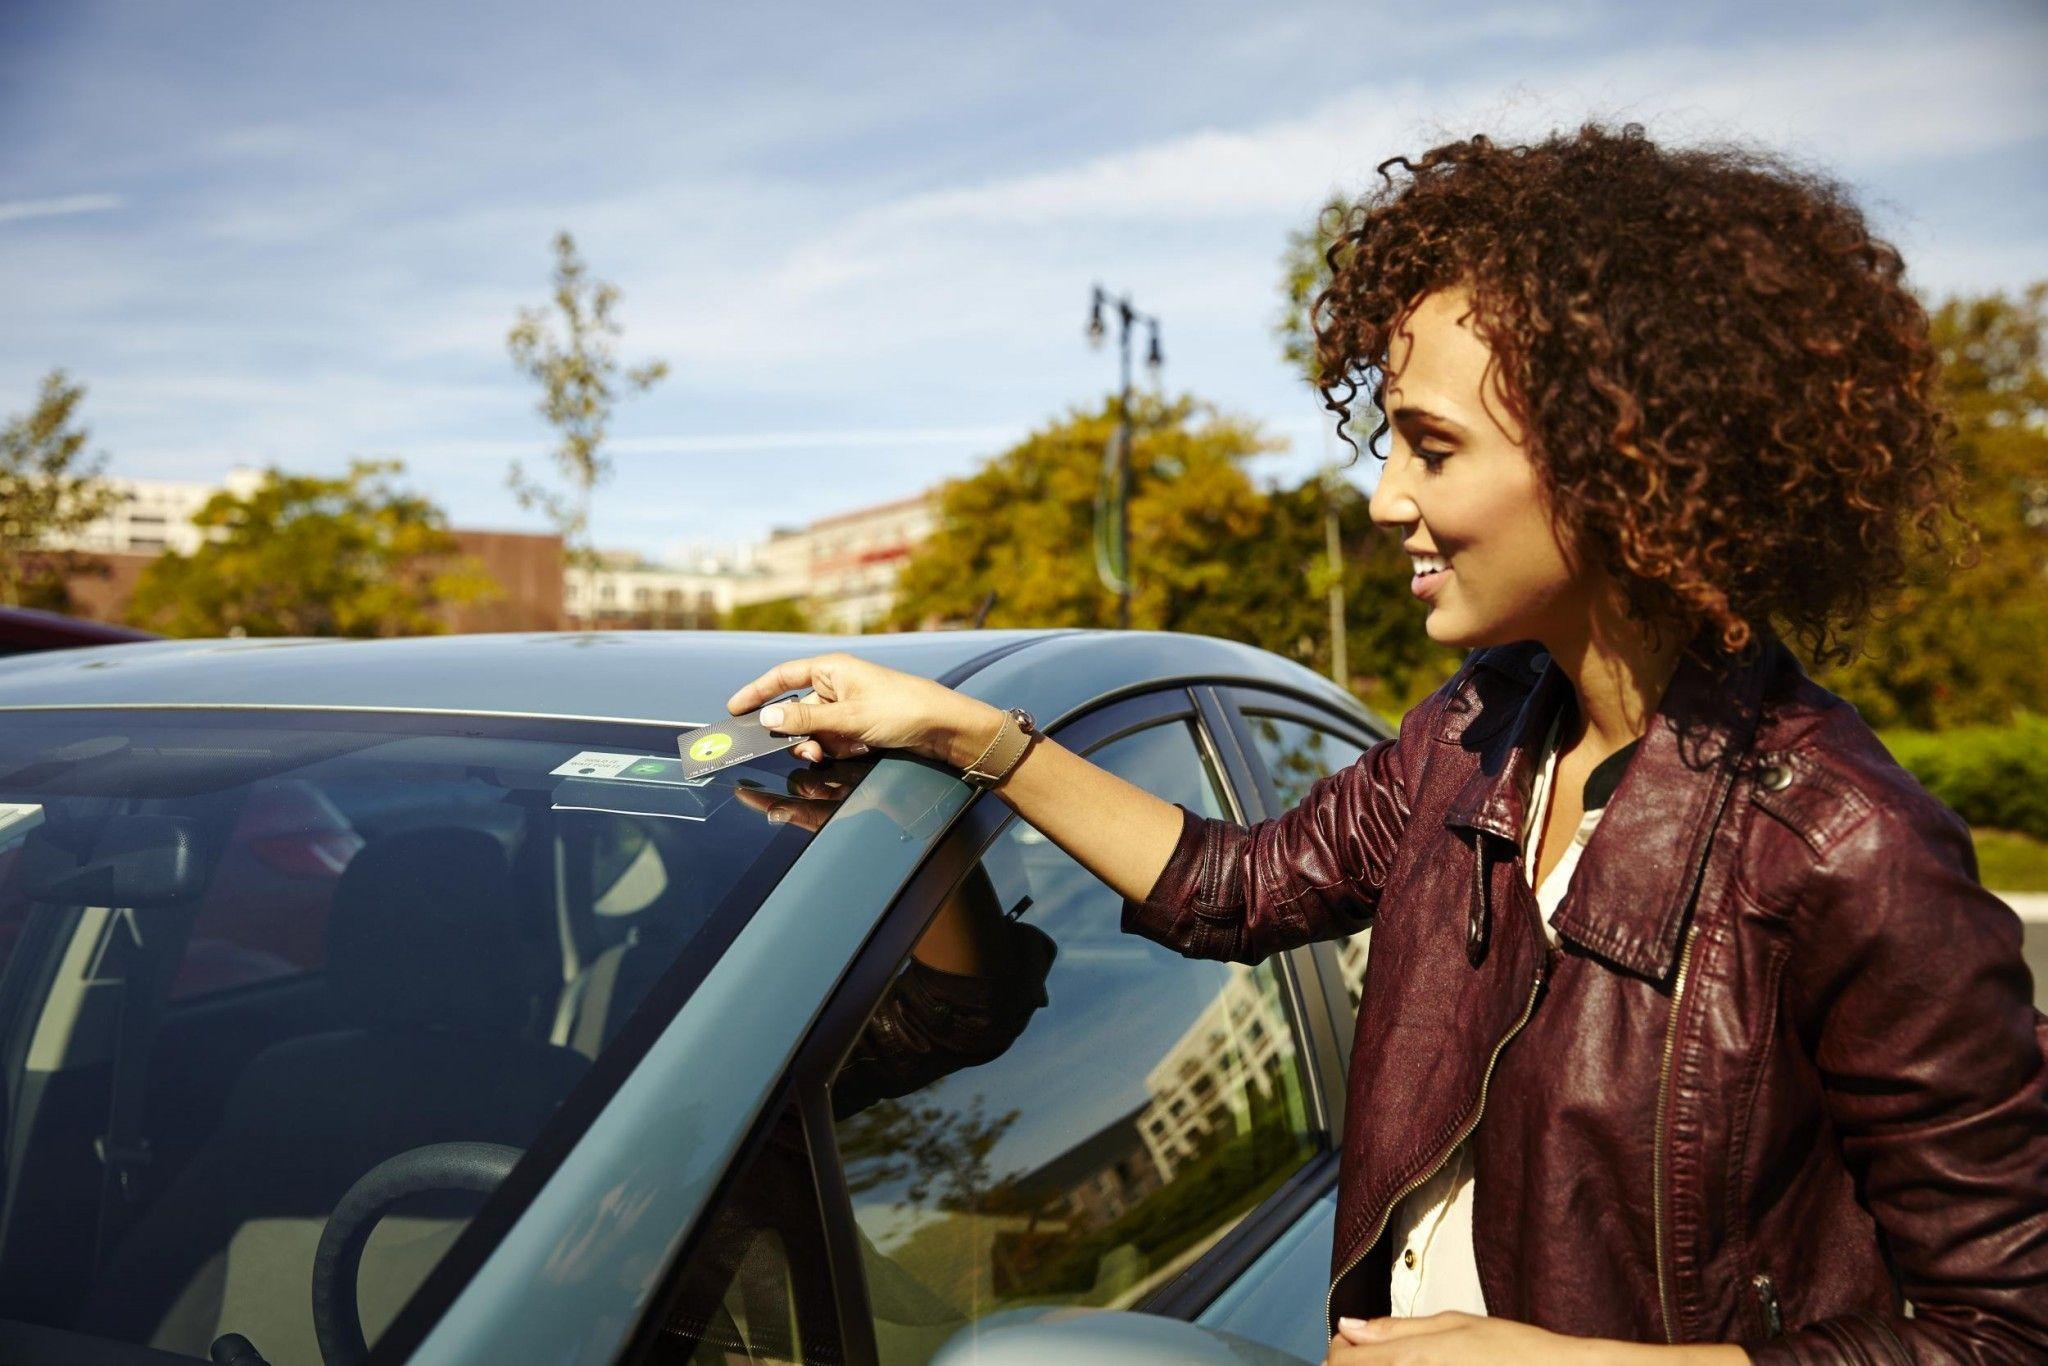 Should You Buy a Car or Drive a Zipcar?